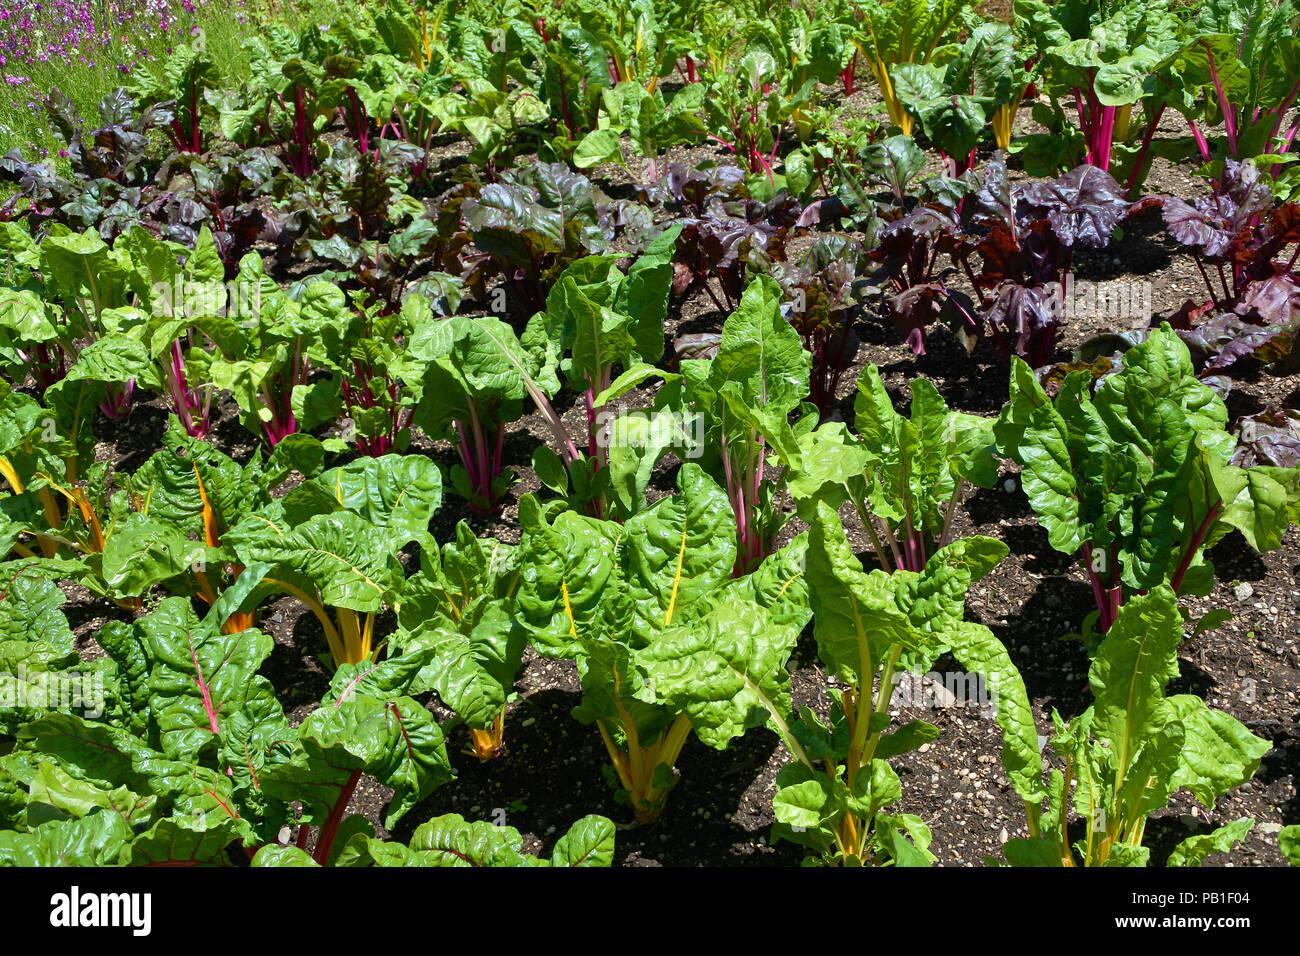 Swiss chard growing in an English kitchen garden - John Gollop - Stock Image